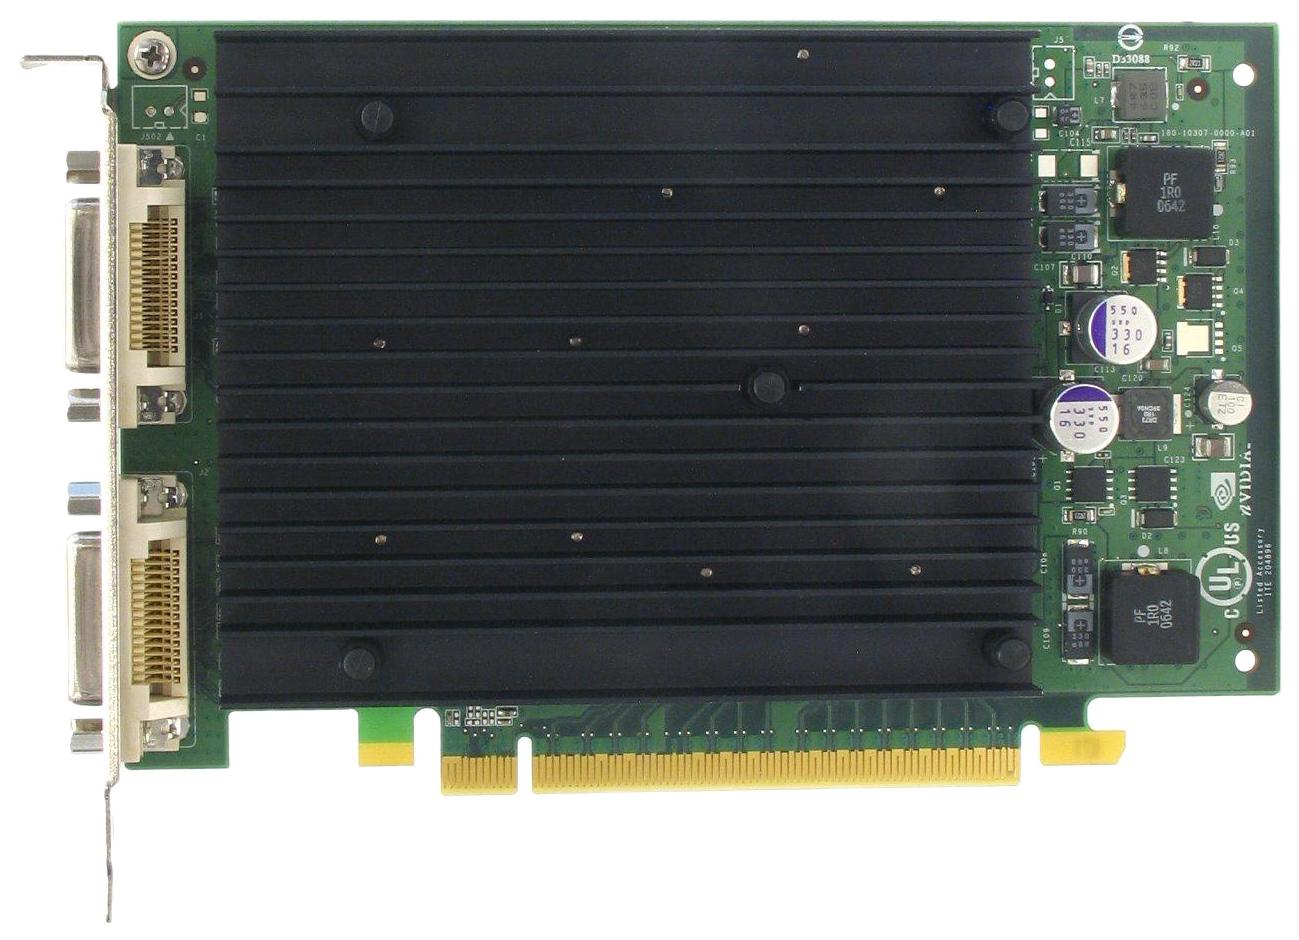 Видеокарта PNY nVidia Quadro NVS 440 (VCQ440NVS